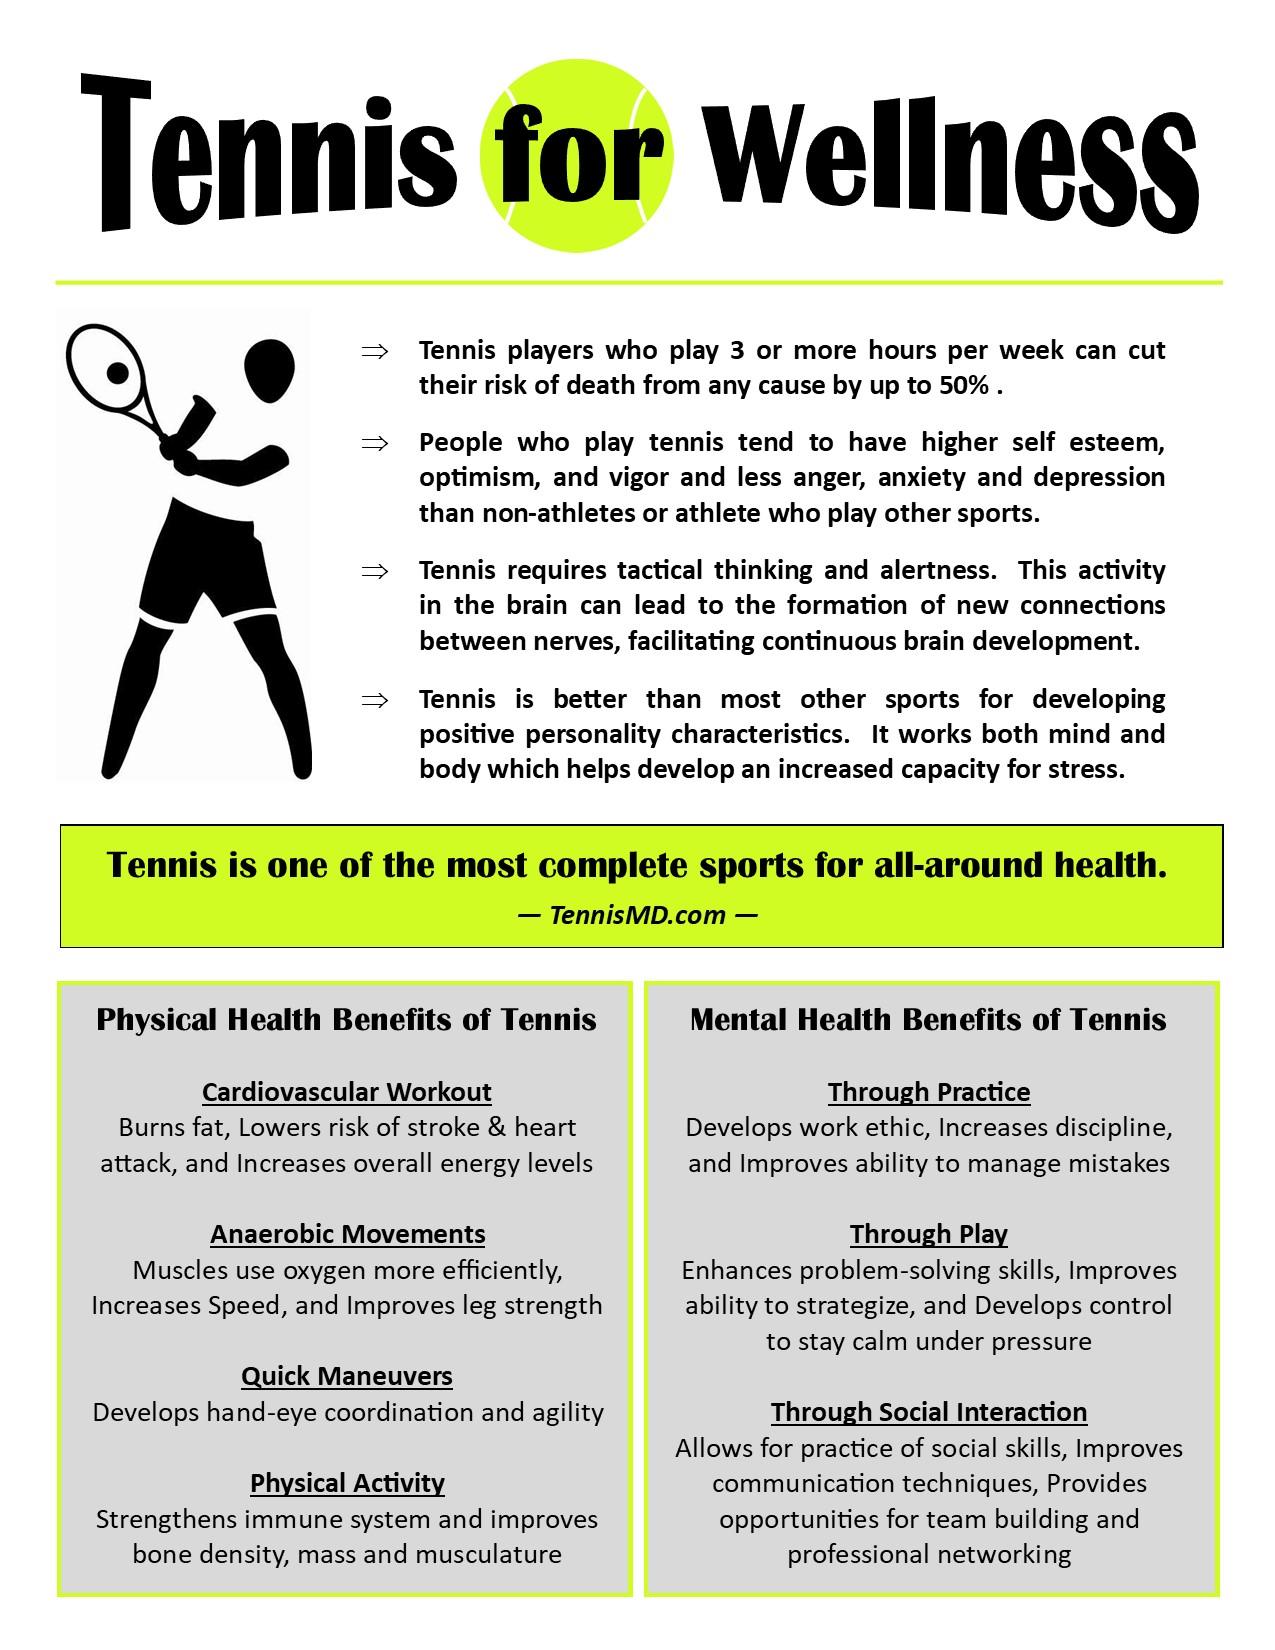 Tennis for Wellness Promotional Flier -